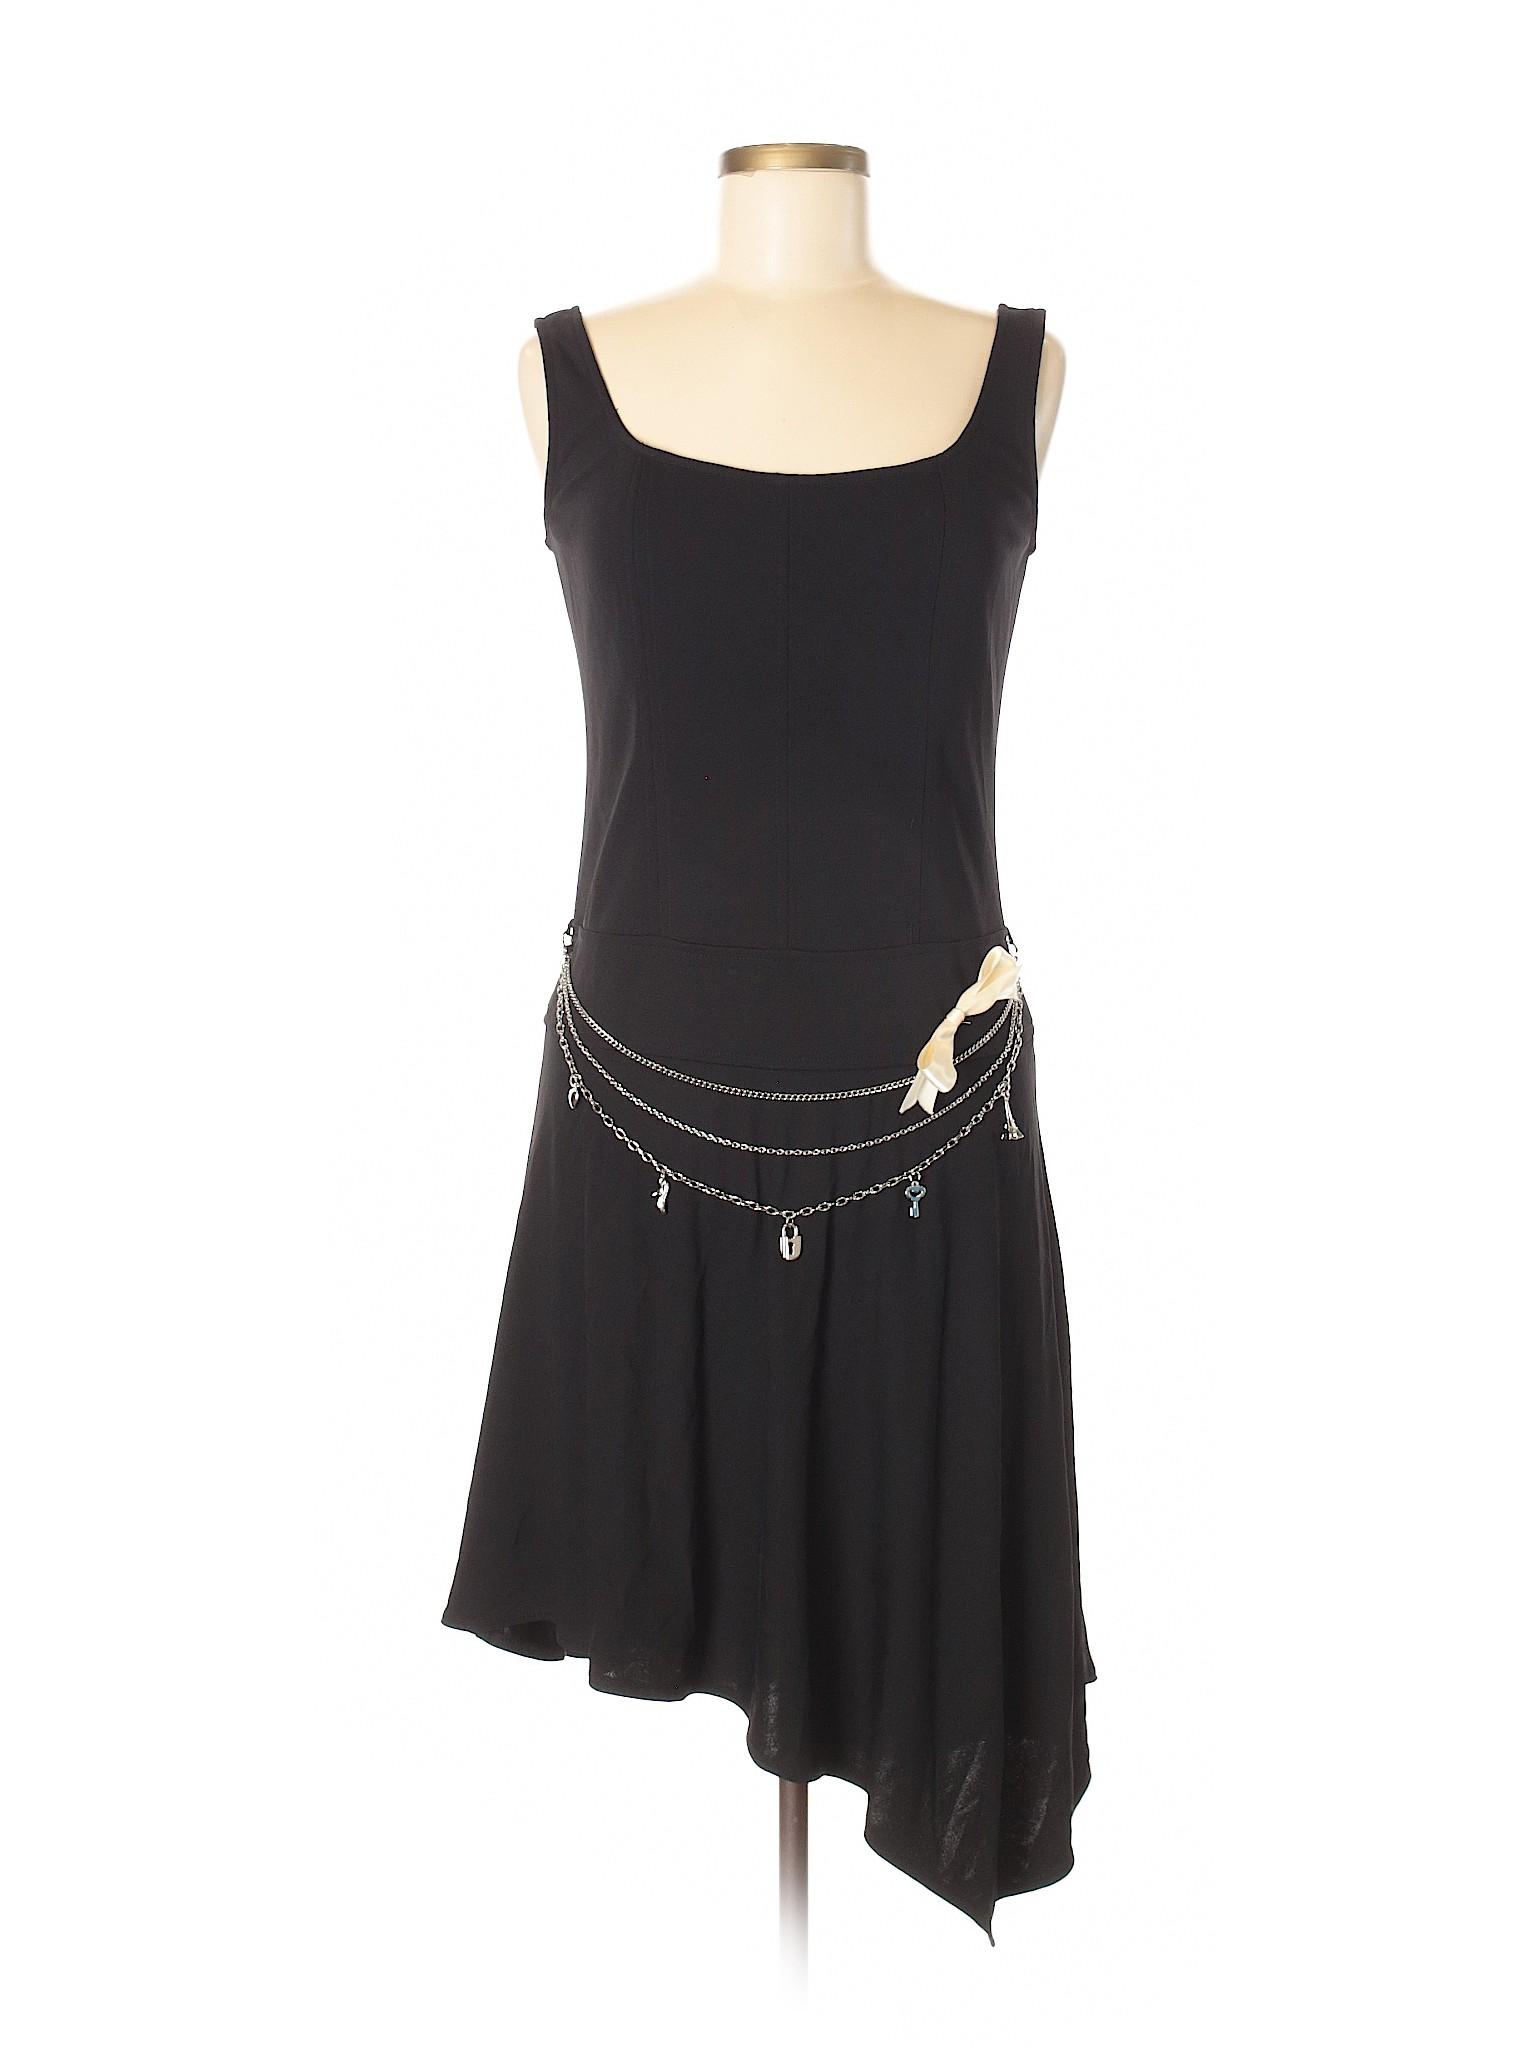 Dress ABS Selling Casual Schwartz Allen FI4aq6wH